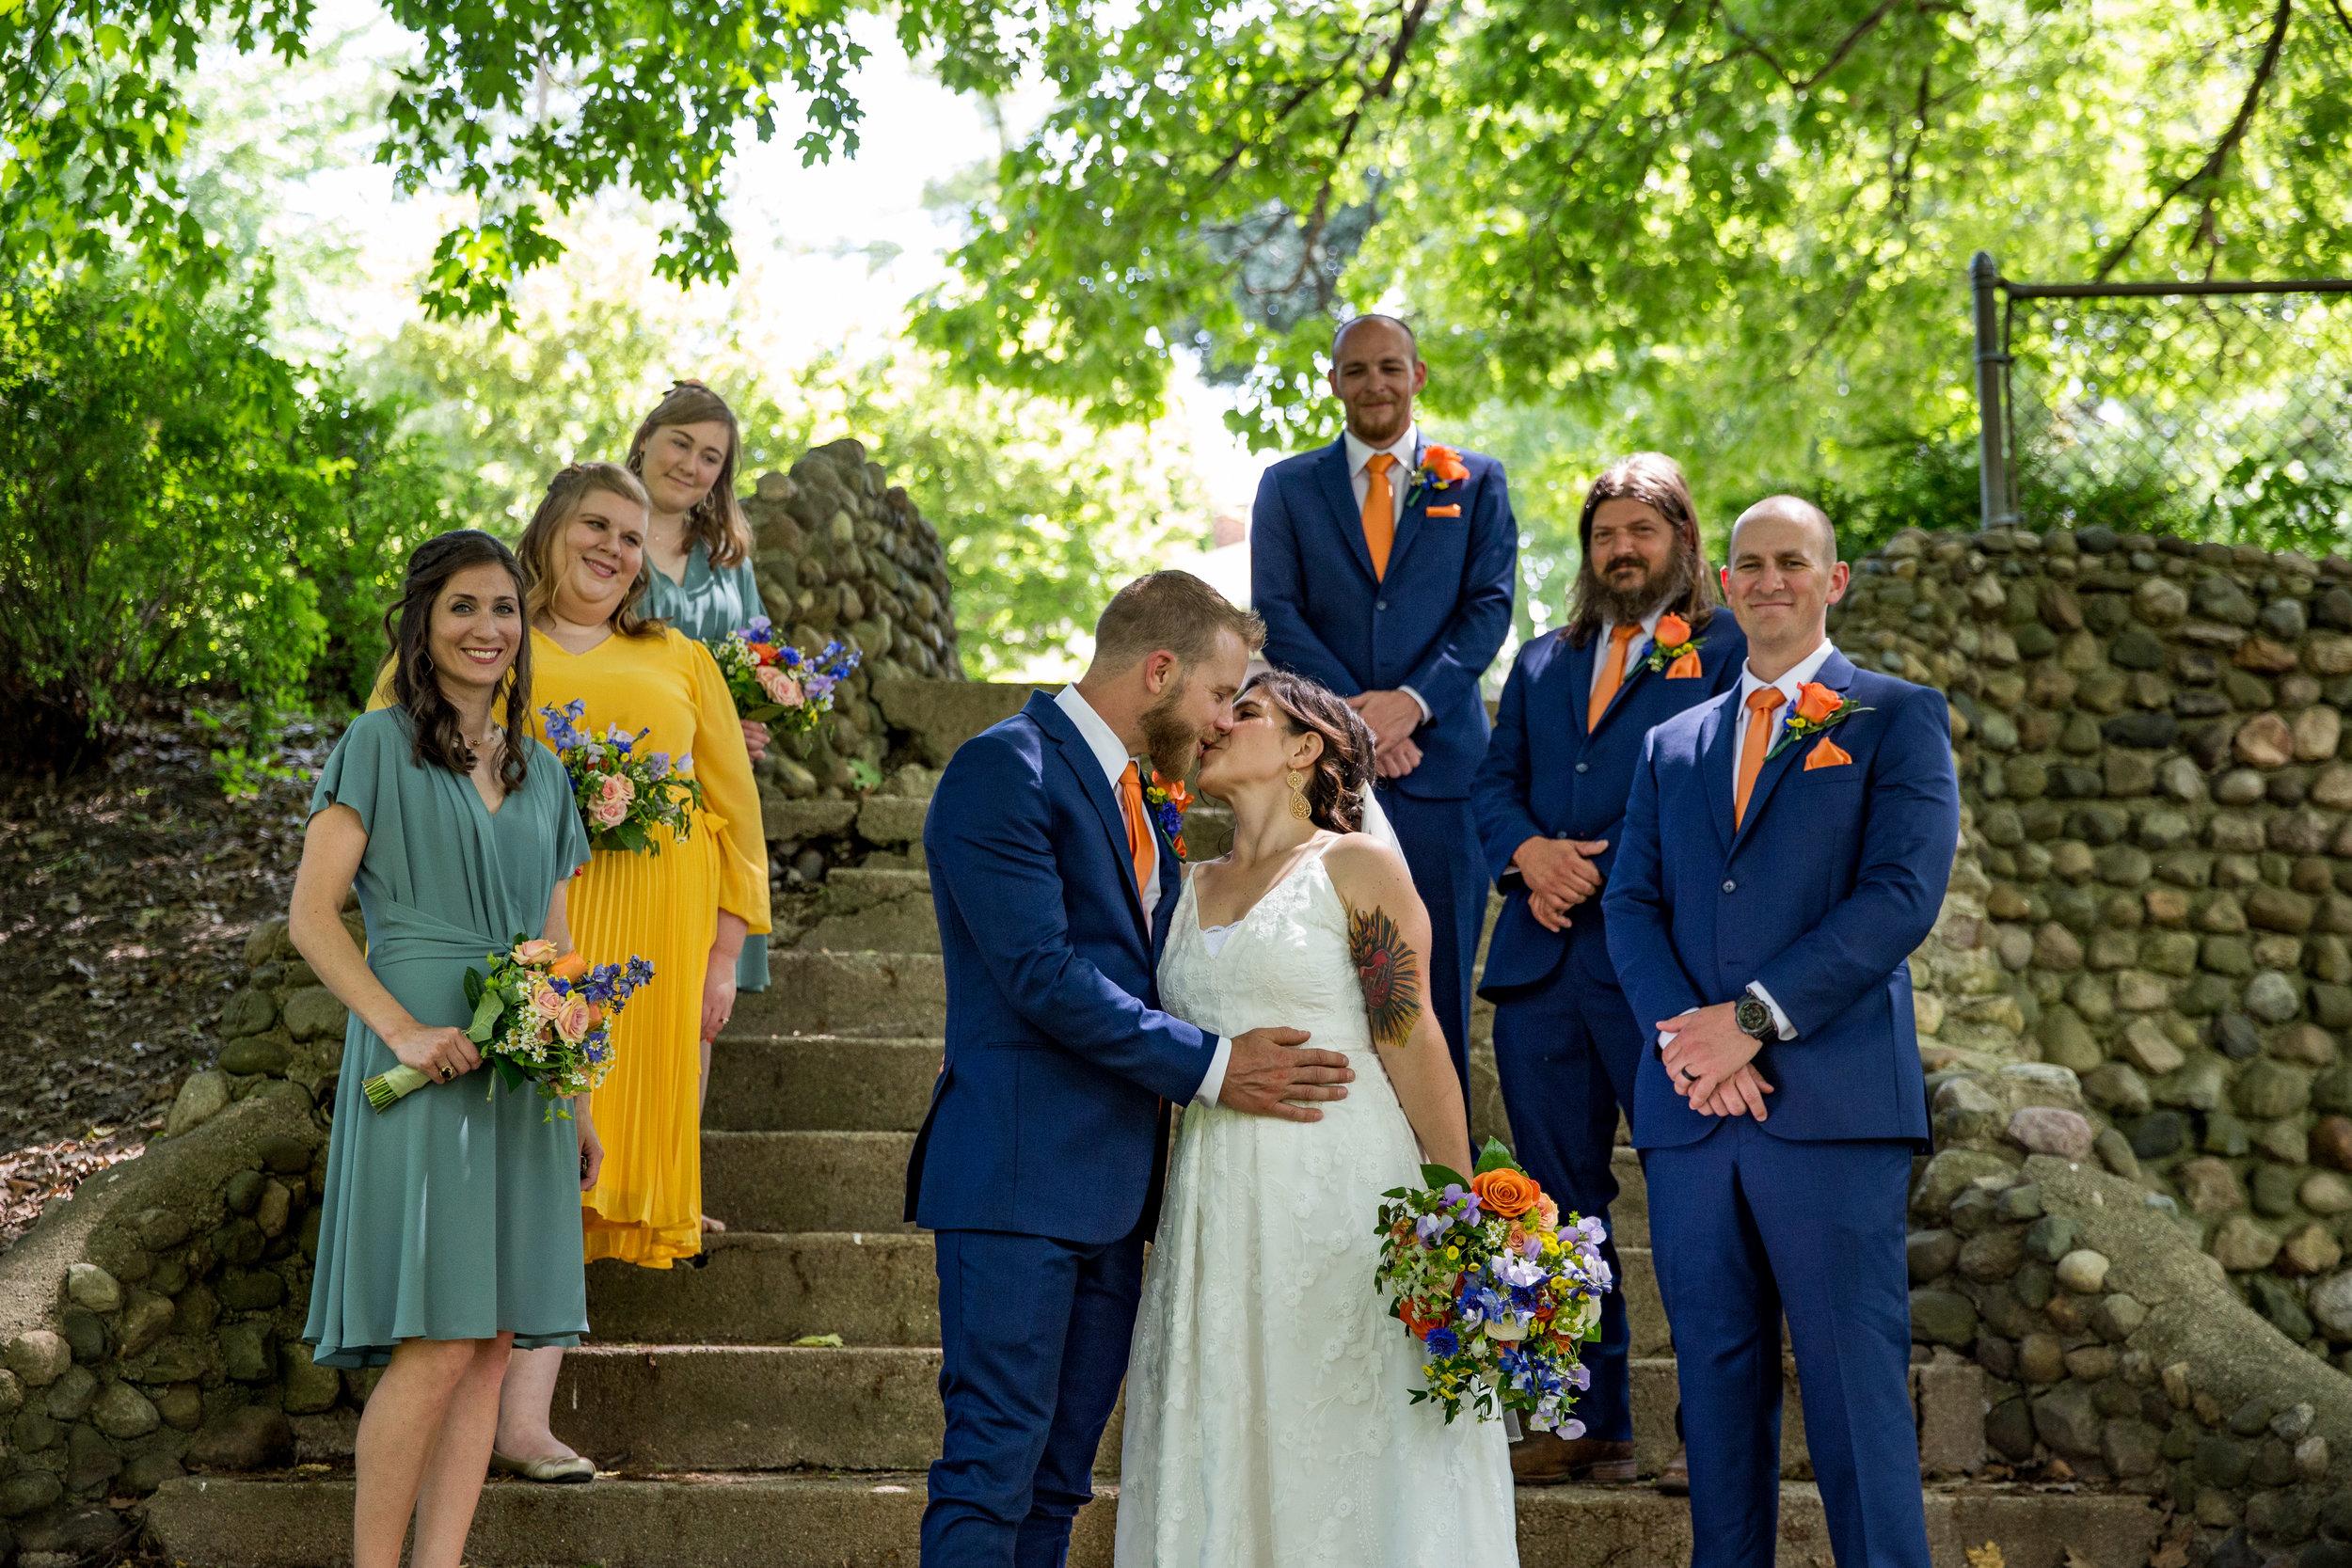 Natalie and Dallas Mooney Wedding 6-8-19_Tania Watt Photography-299.jpg